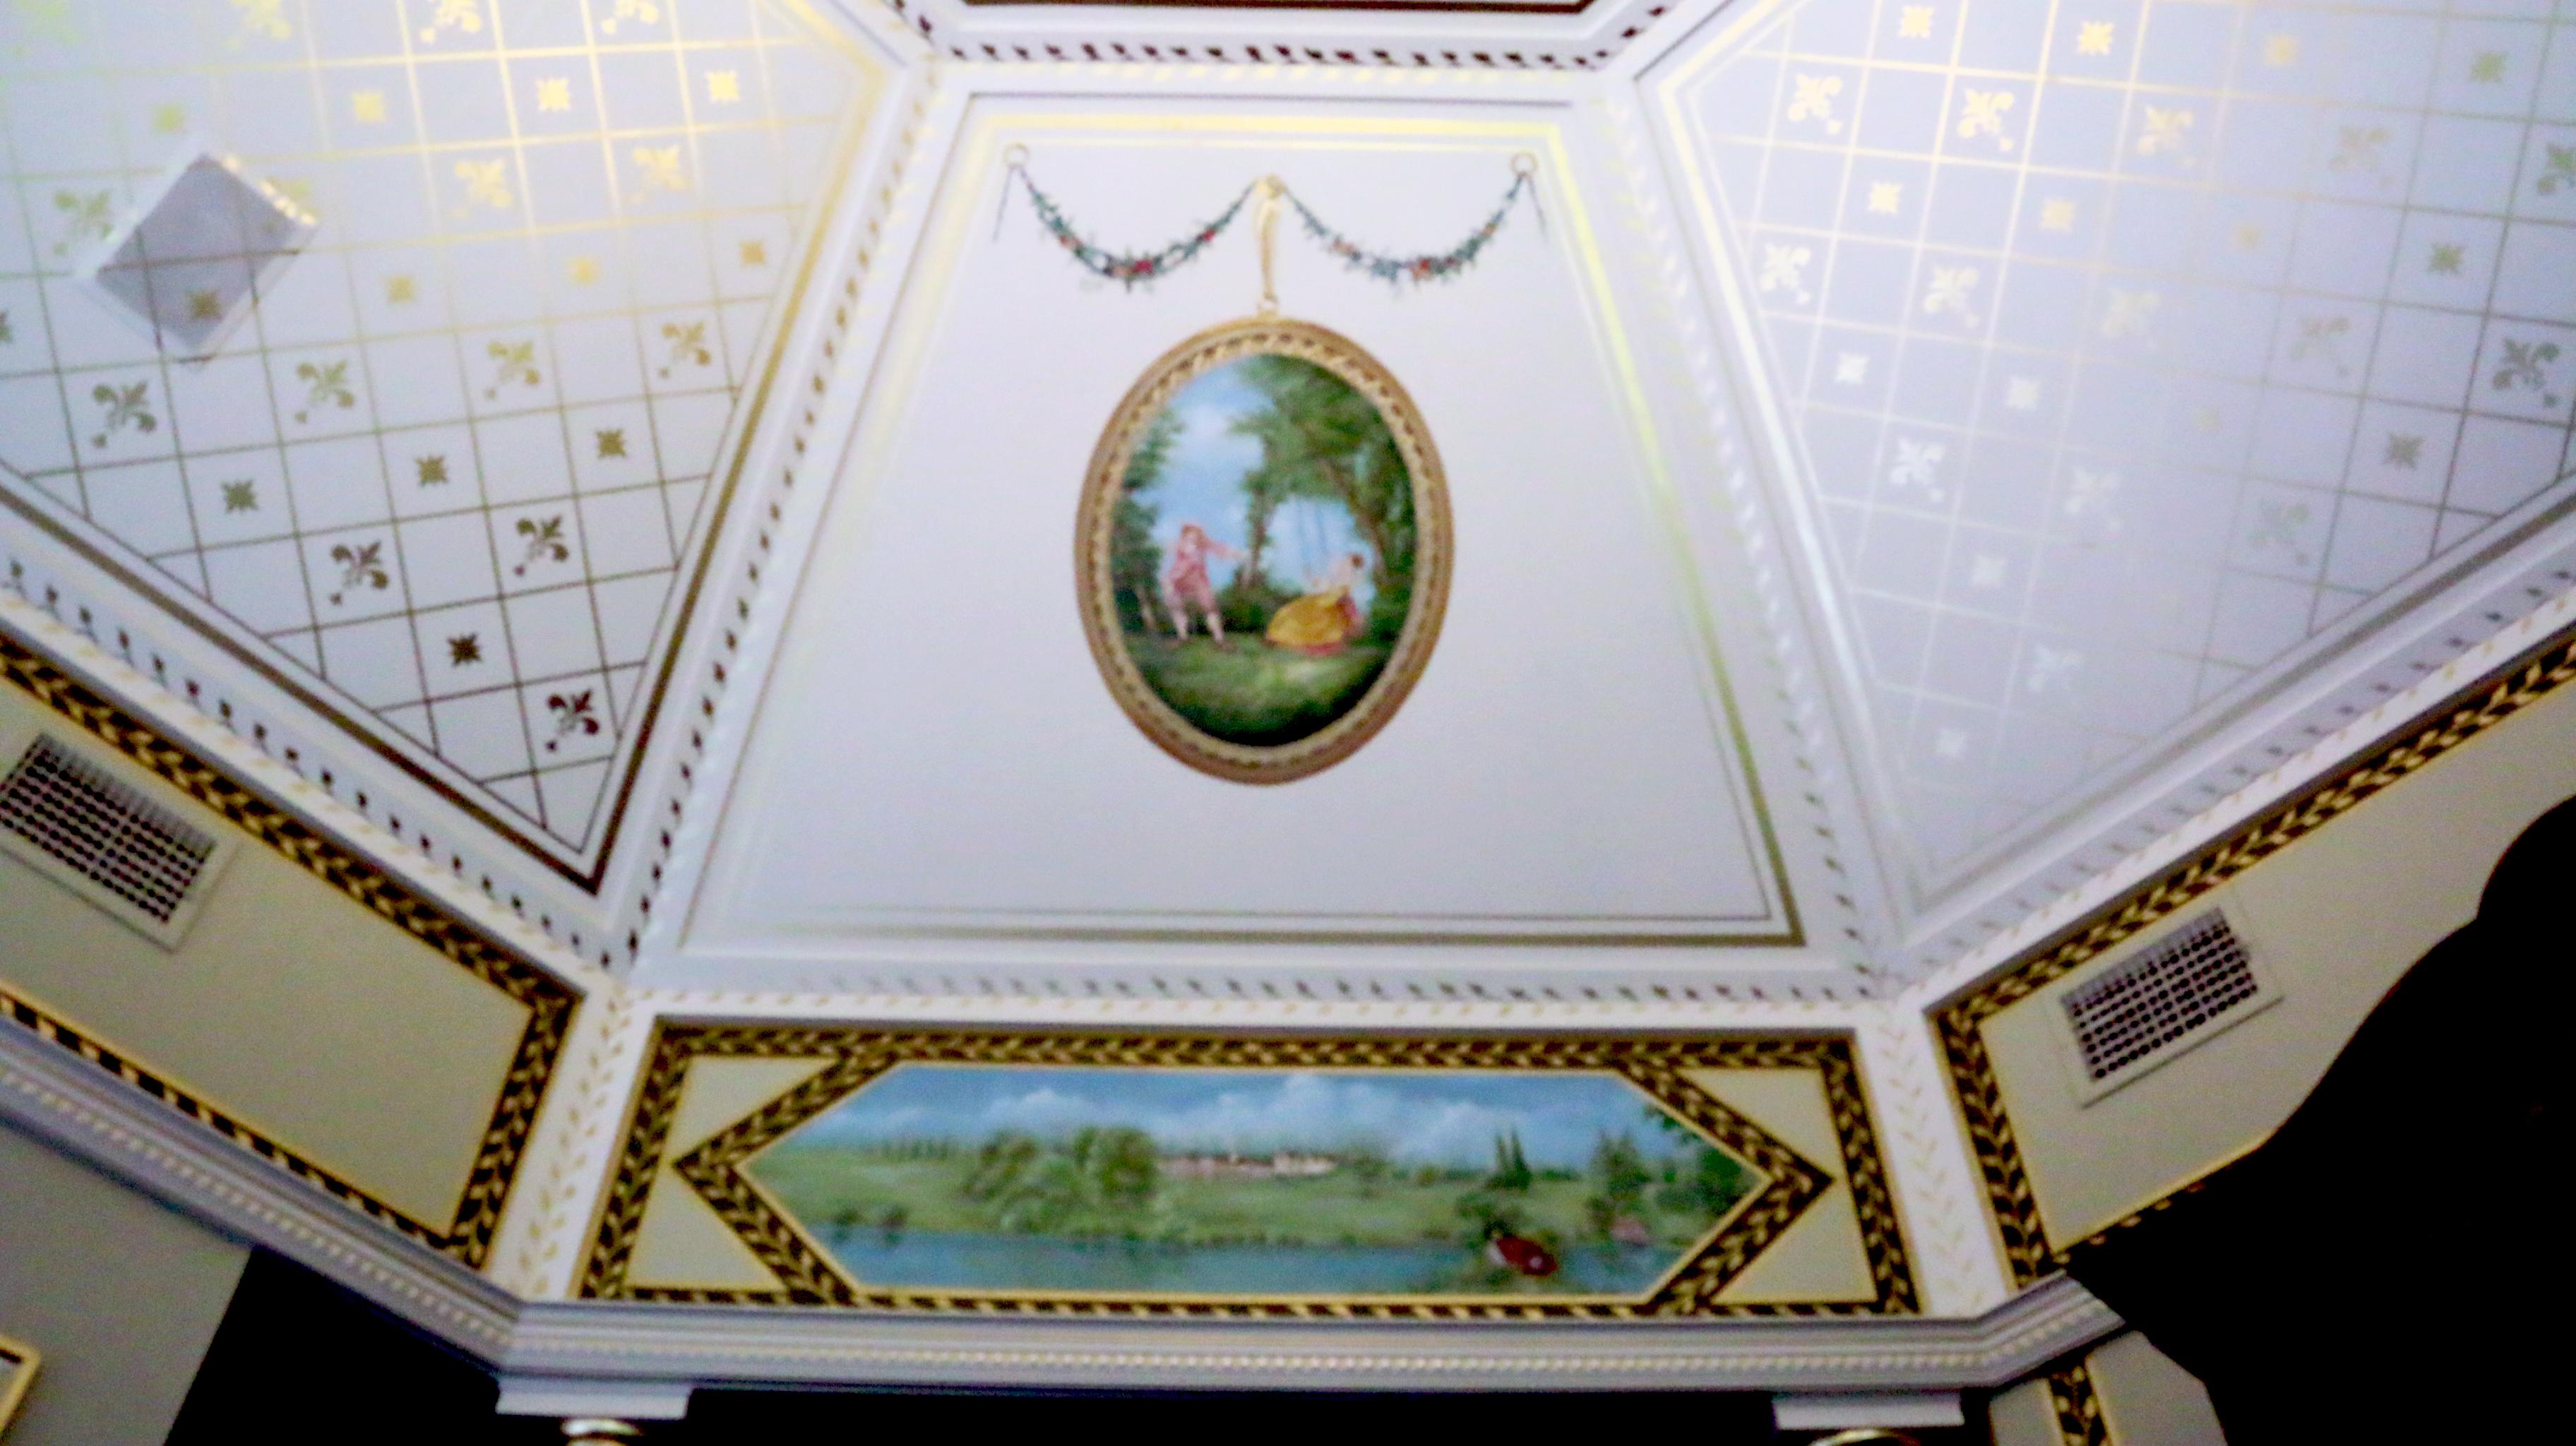 Mural & Ceiling Dome Rumson NJ